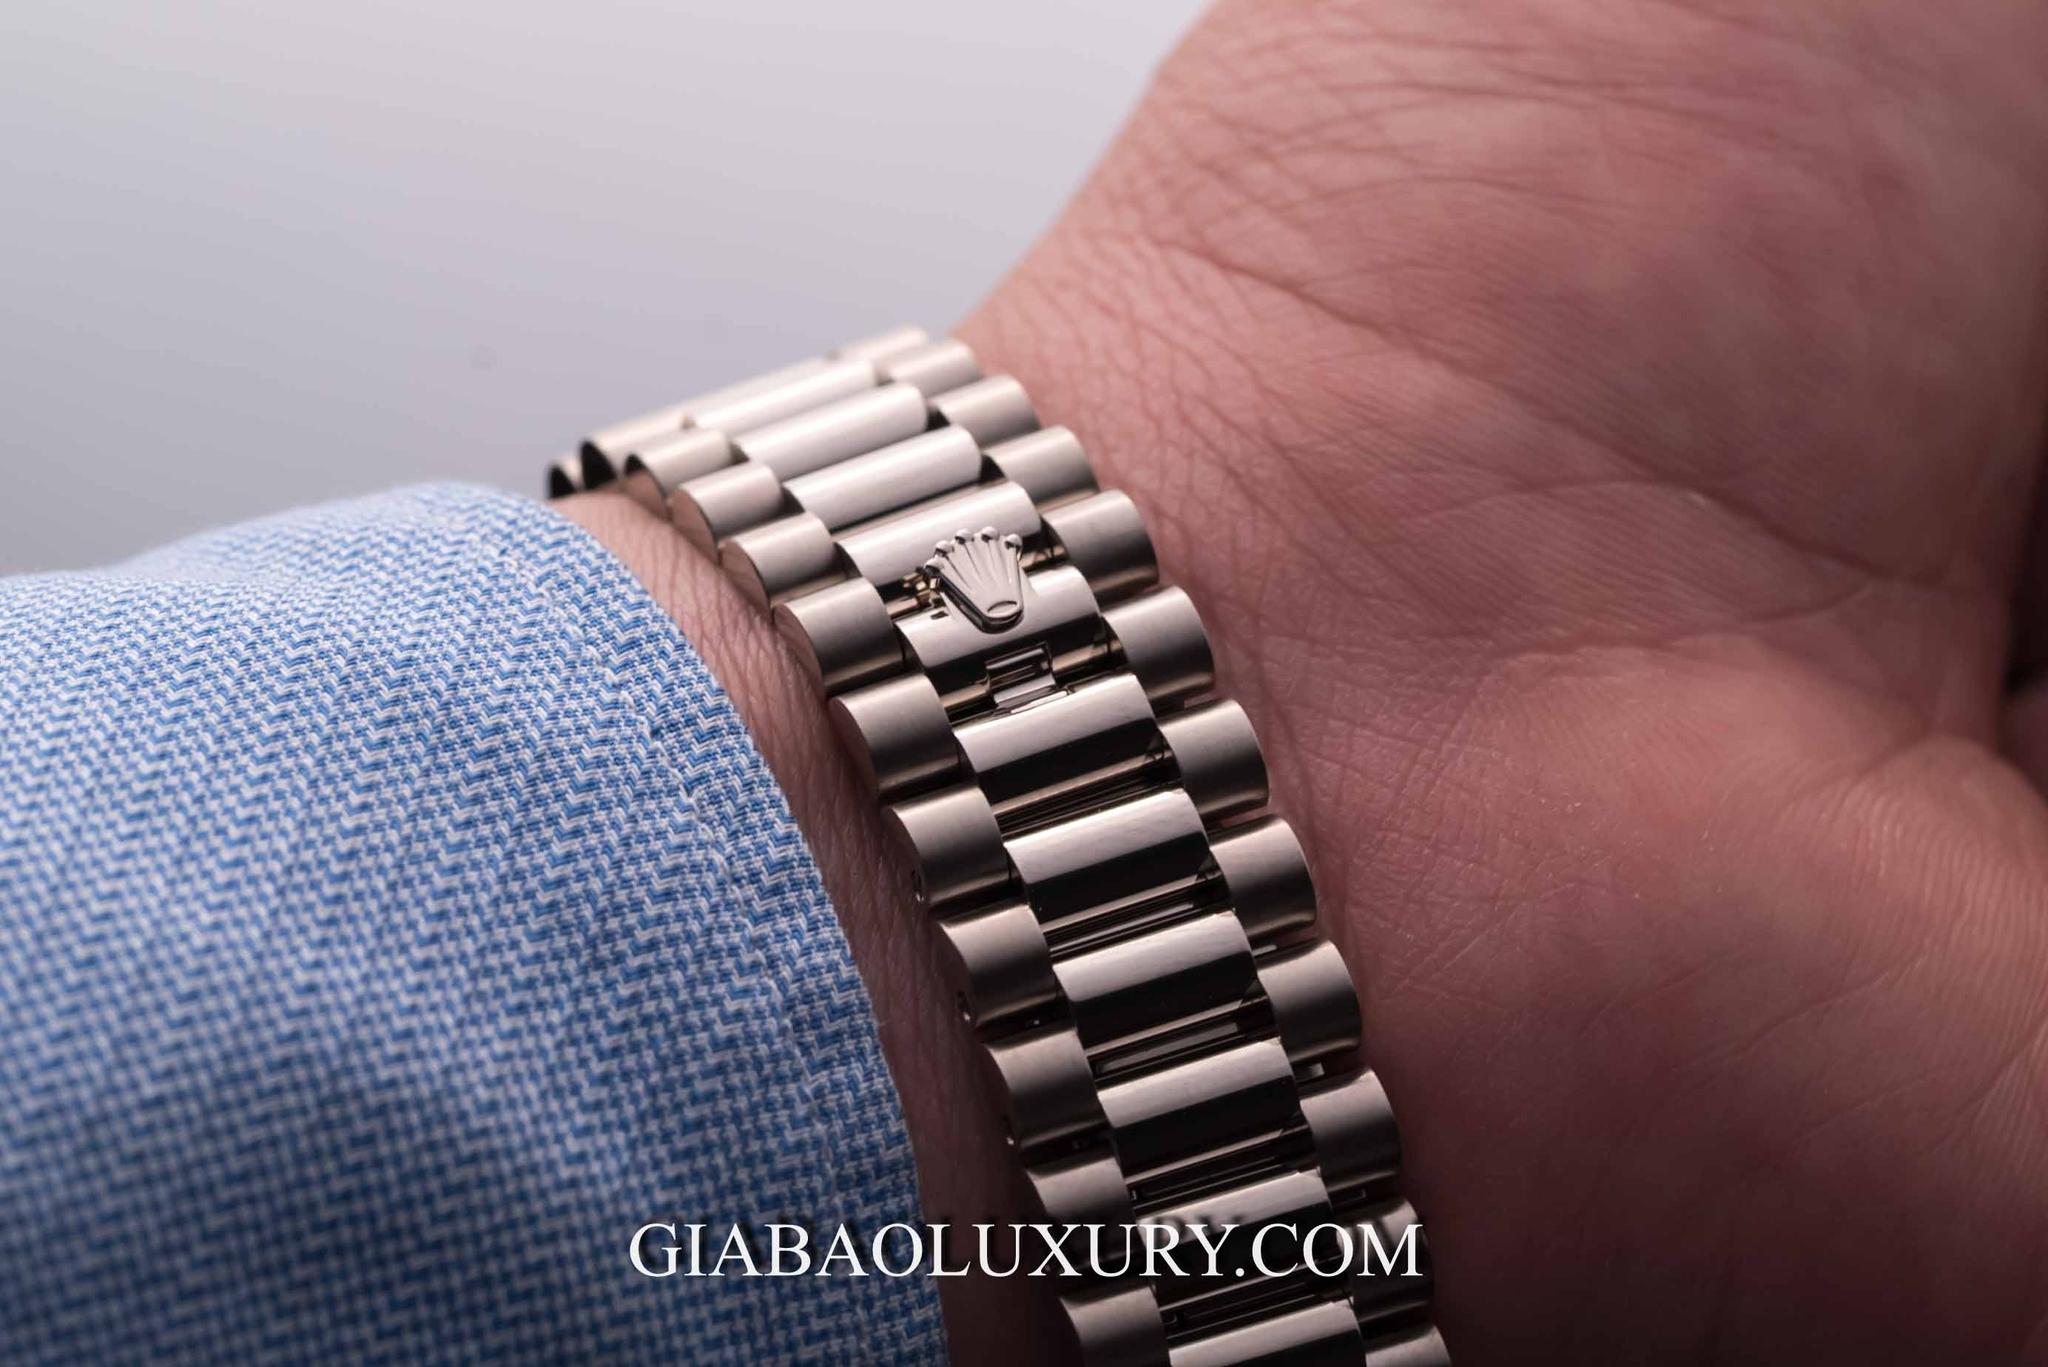 Rolex Day-Date 40 ref. 228239: Còn mãi với thời gian